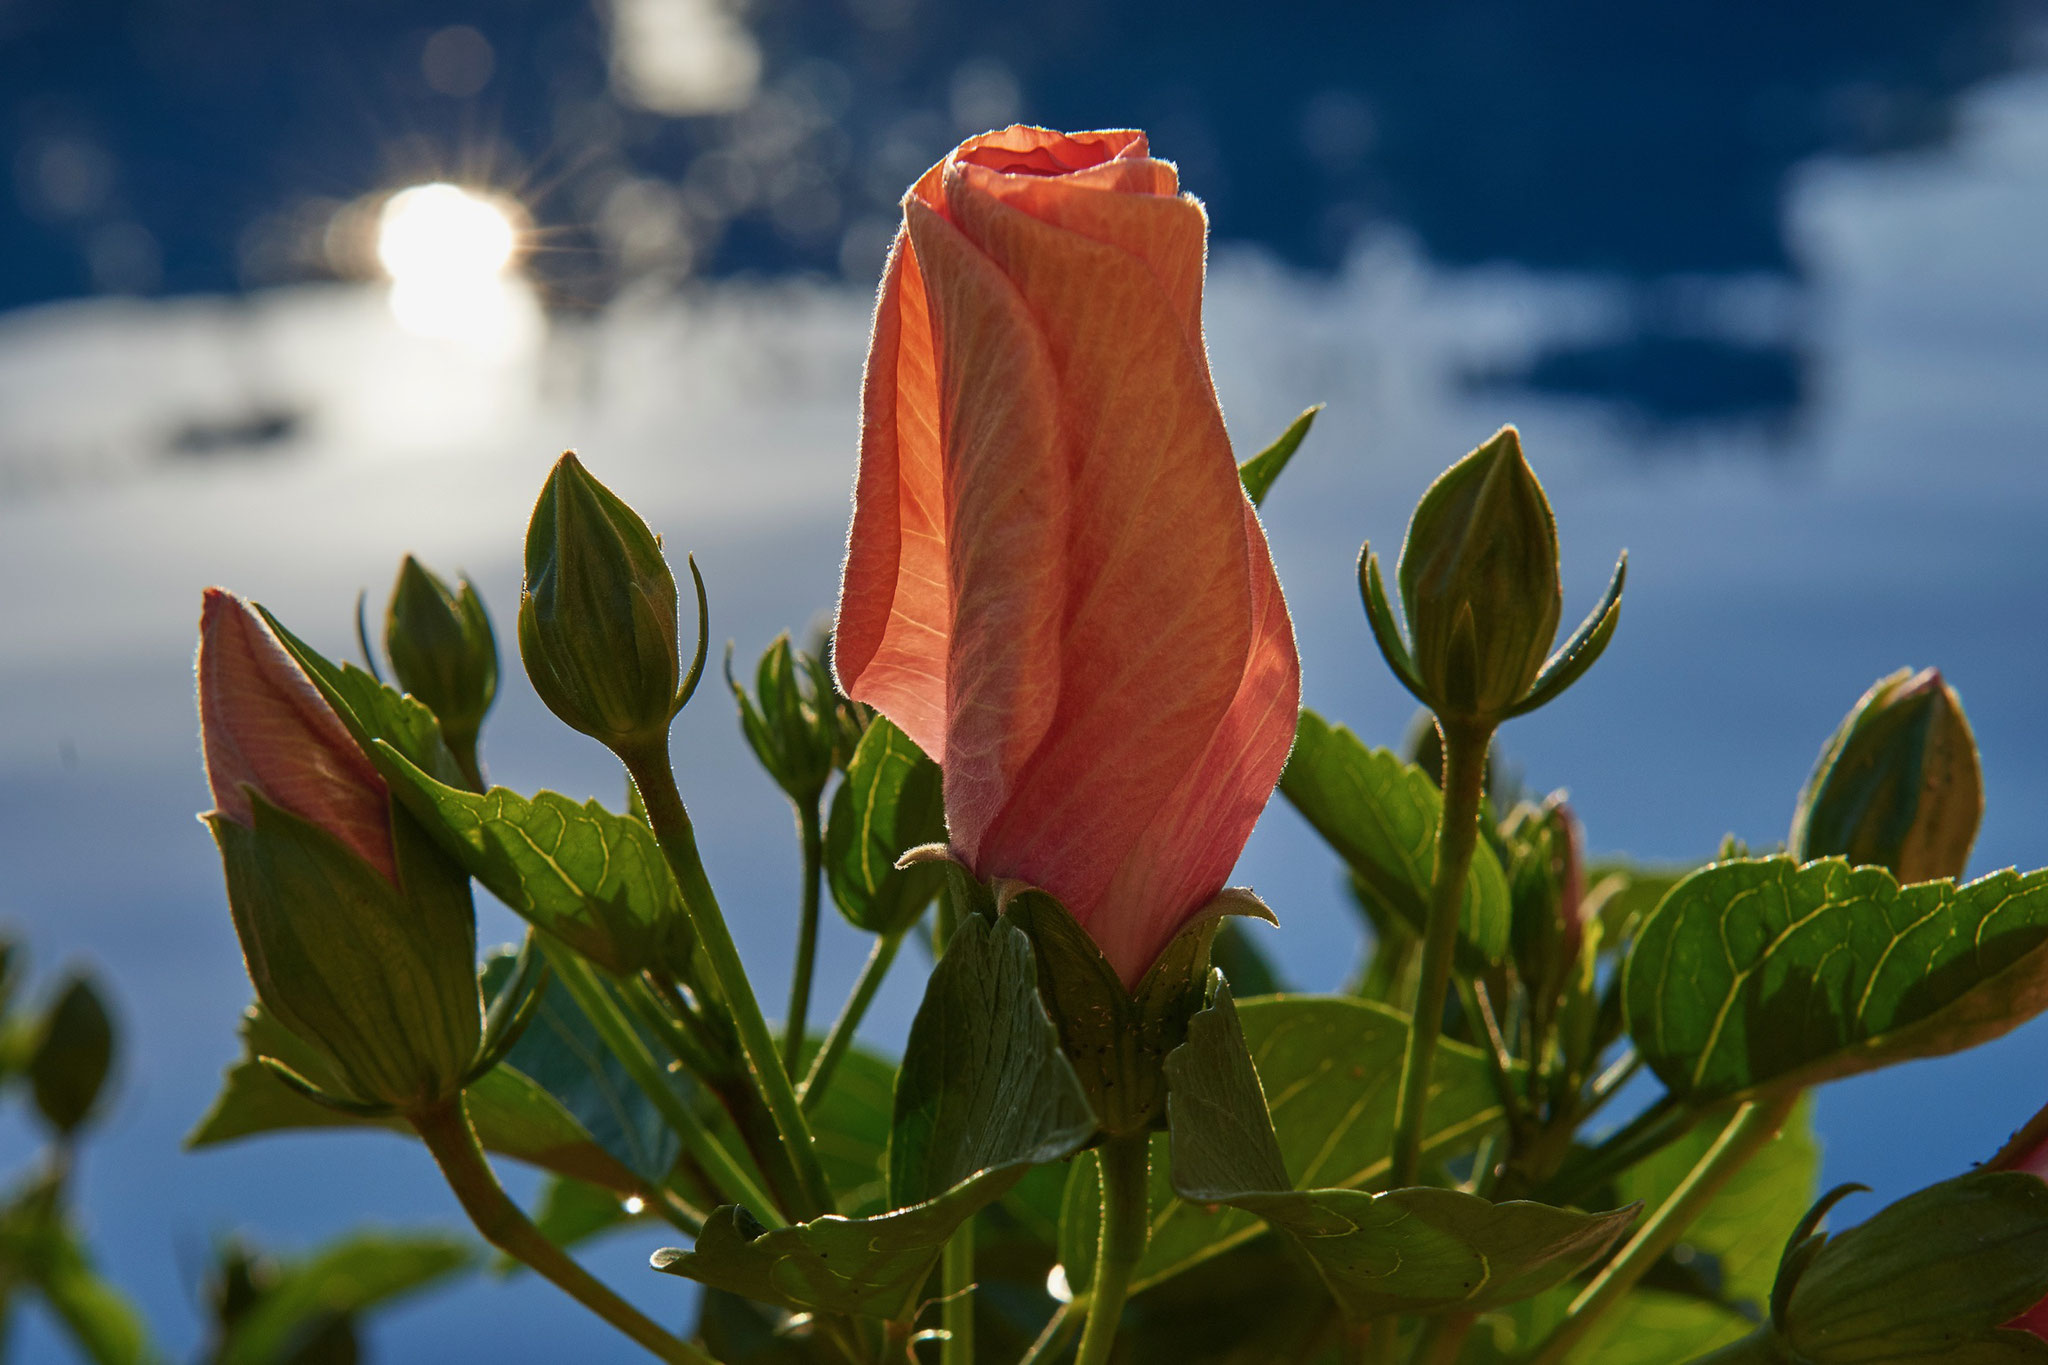 Hibiskusblüte kurz vor dem Aufblühen - Tschaggo